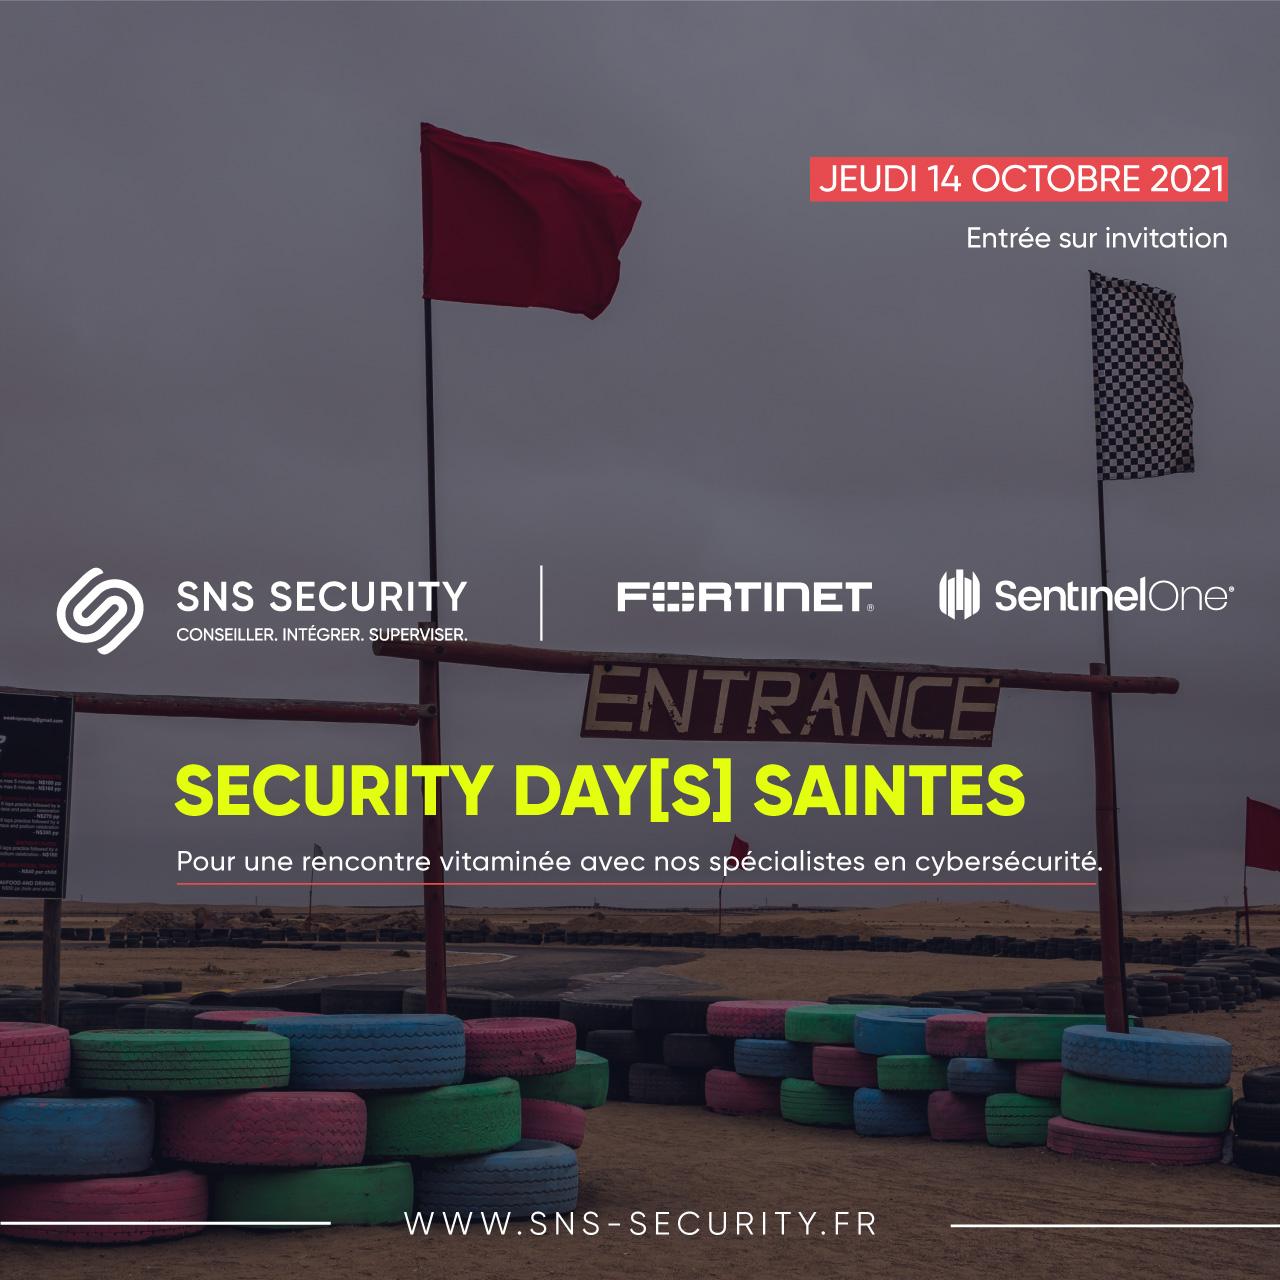 evenement security days saintes fortinet sentinelone